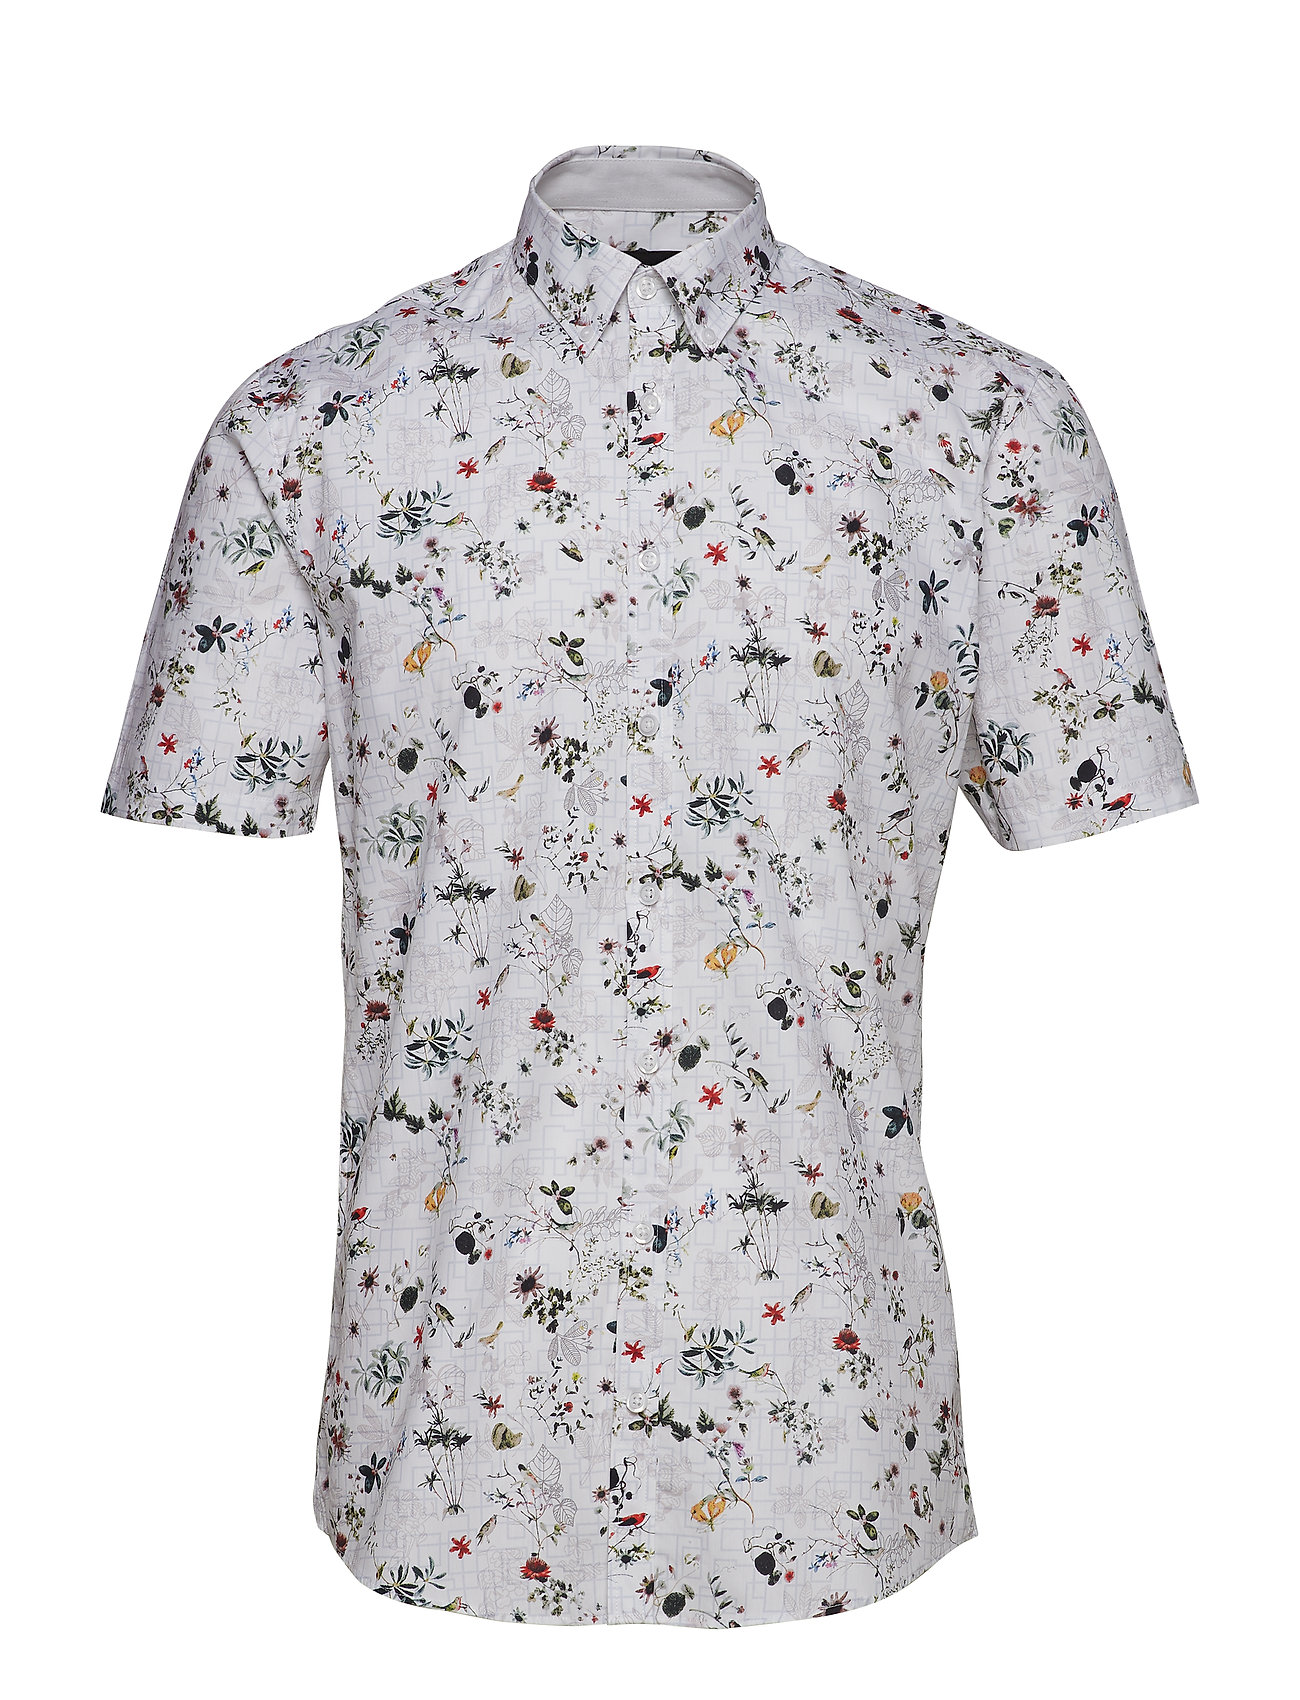 Lindbergh Floral cotton shirt S/S - WHITE